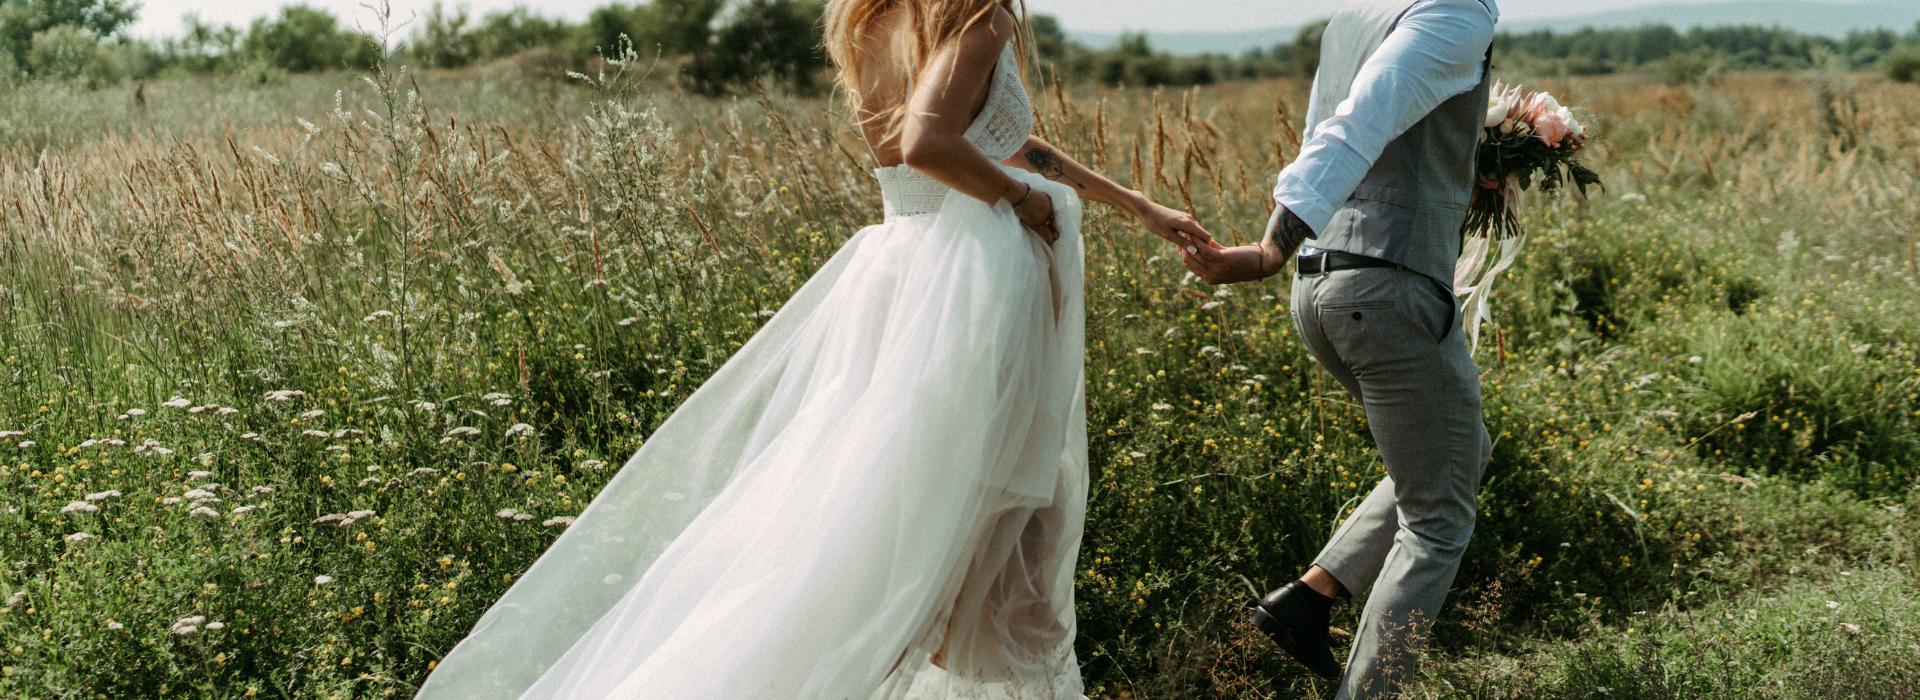 Woman and man in wedding attire running through field